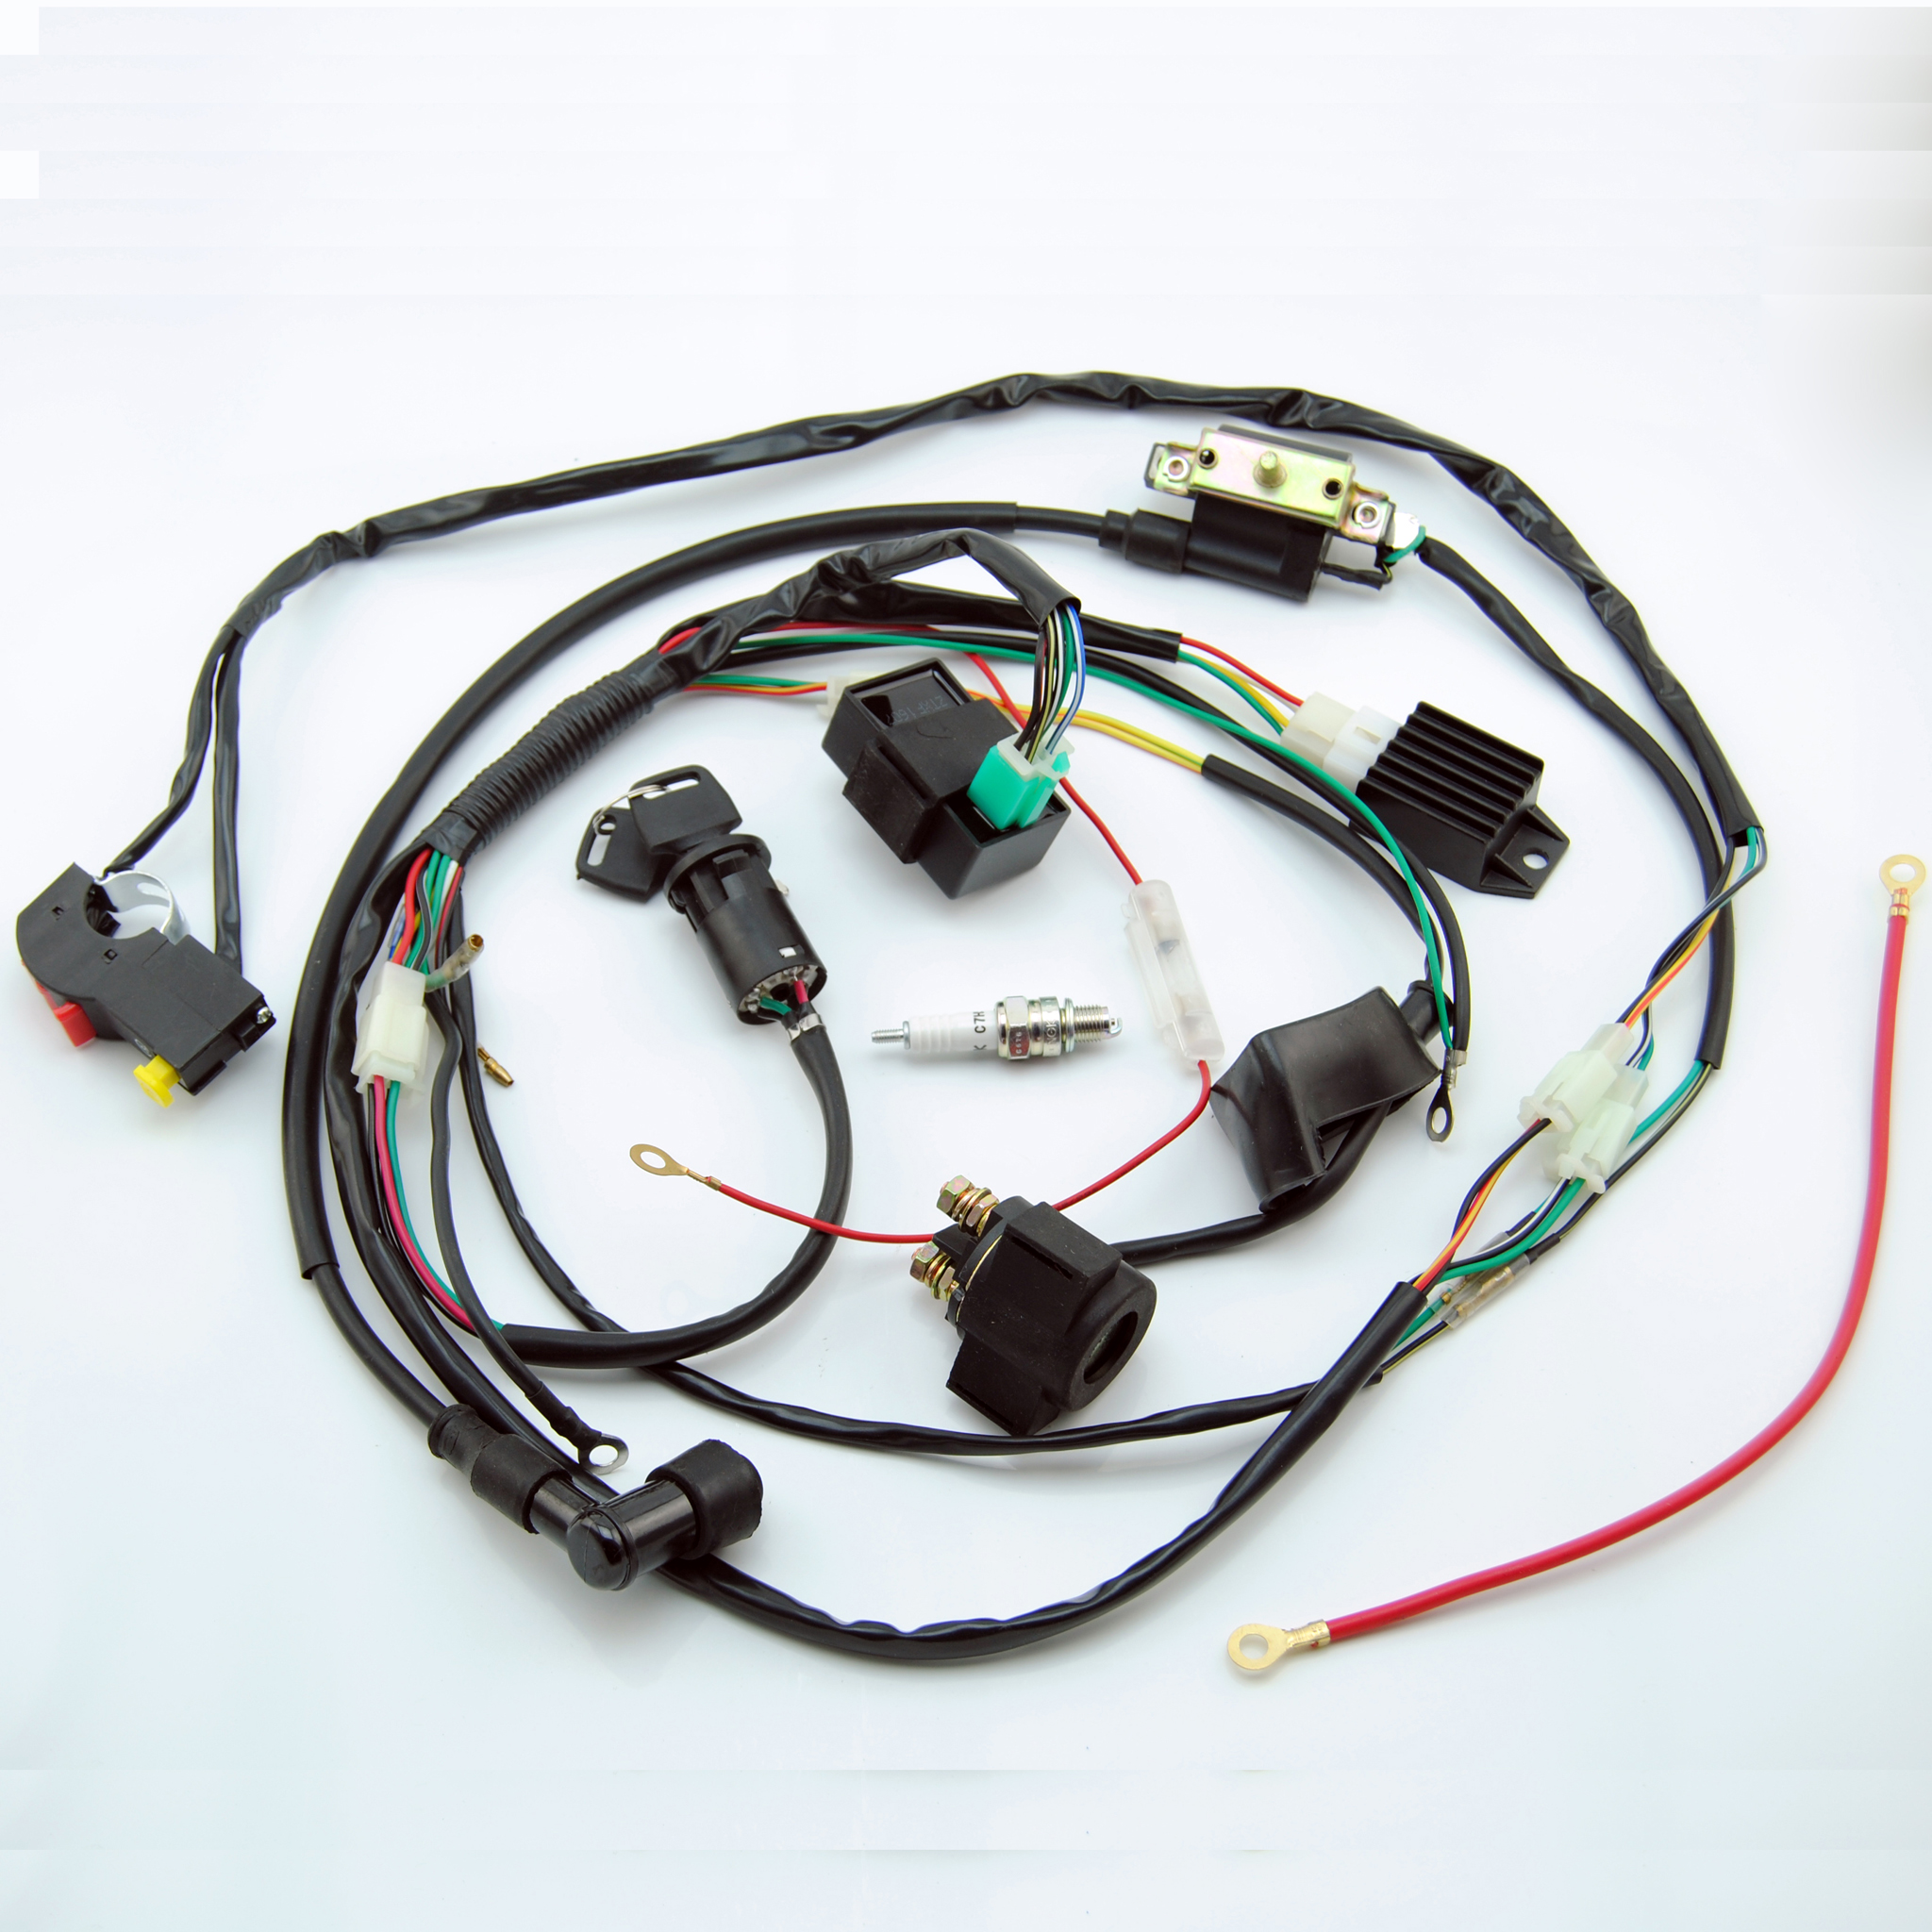 hight resolution of dinli wiring diagram